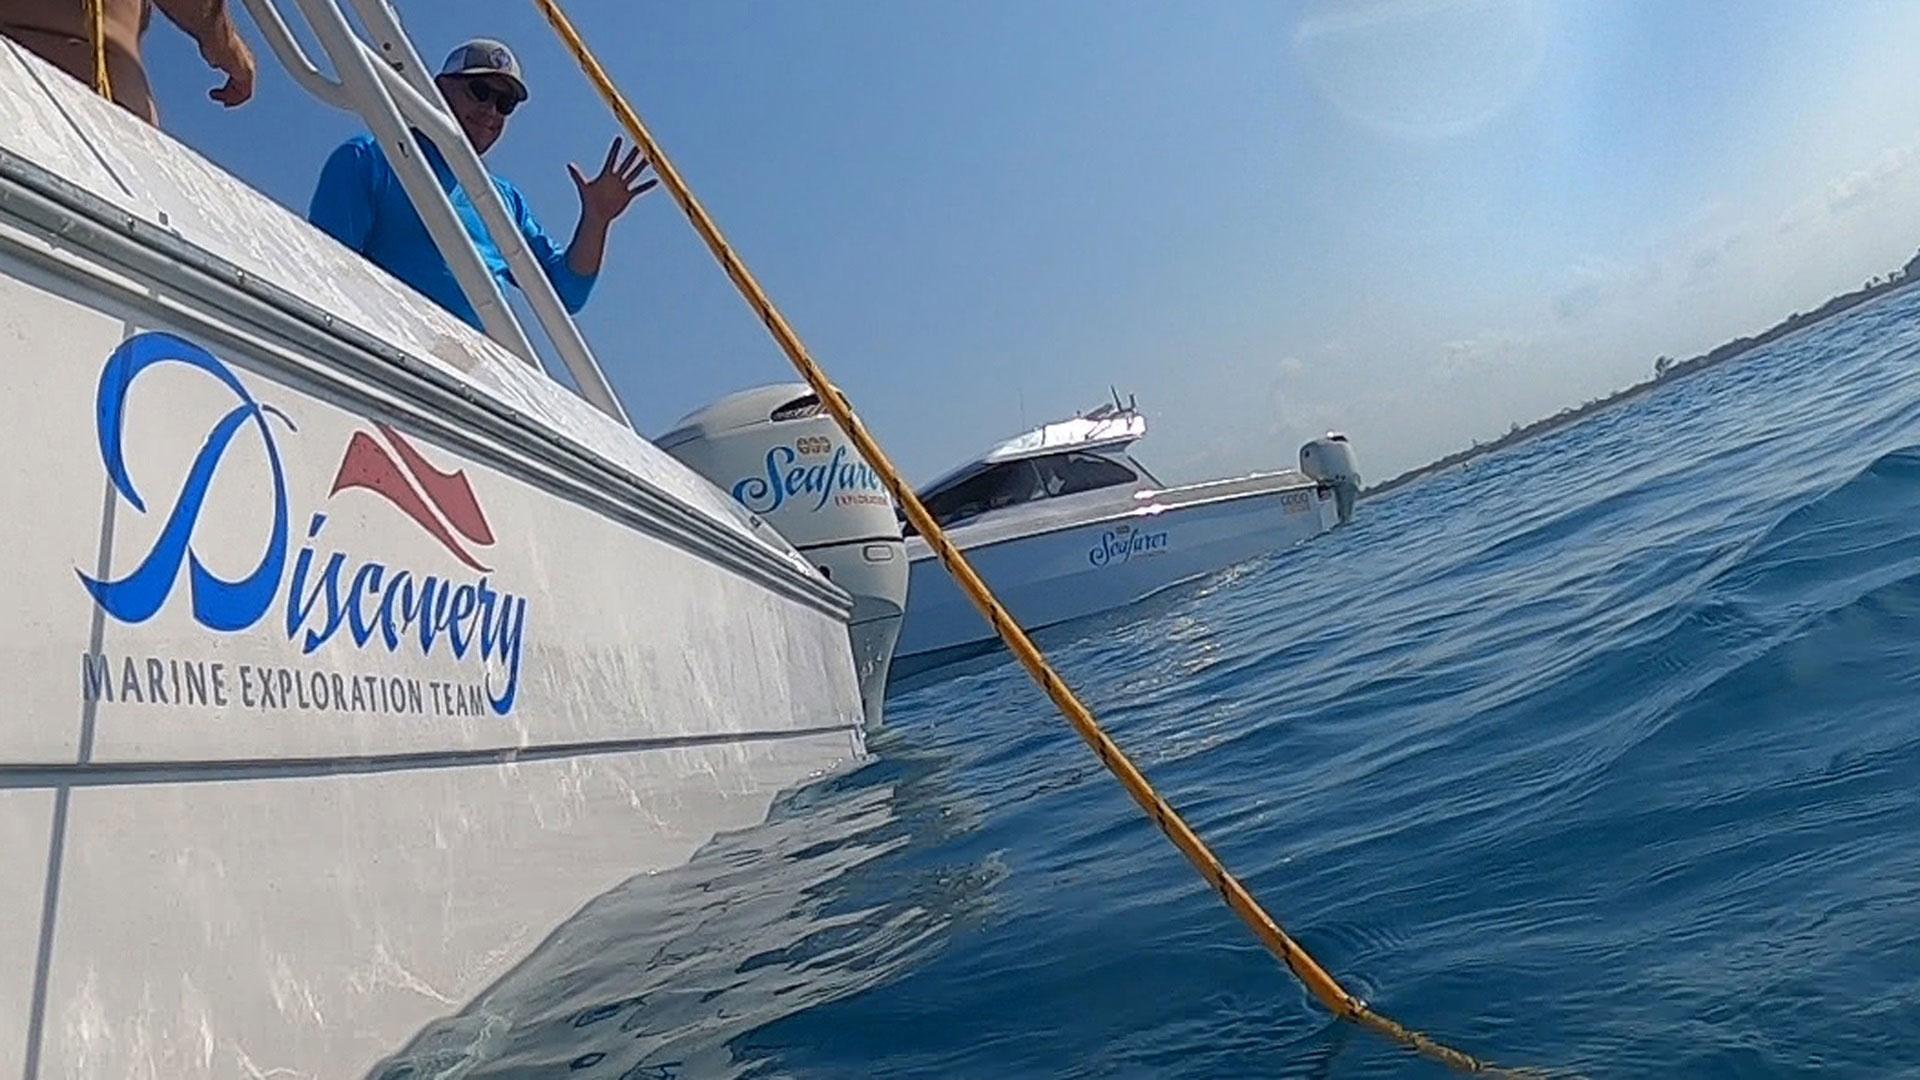 Seafarer-Exploration-Corp-SeaSearcher-Hydro-Probe-Discovery-Good-Fortune-Boat